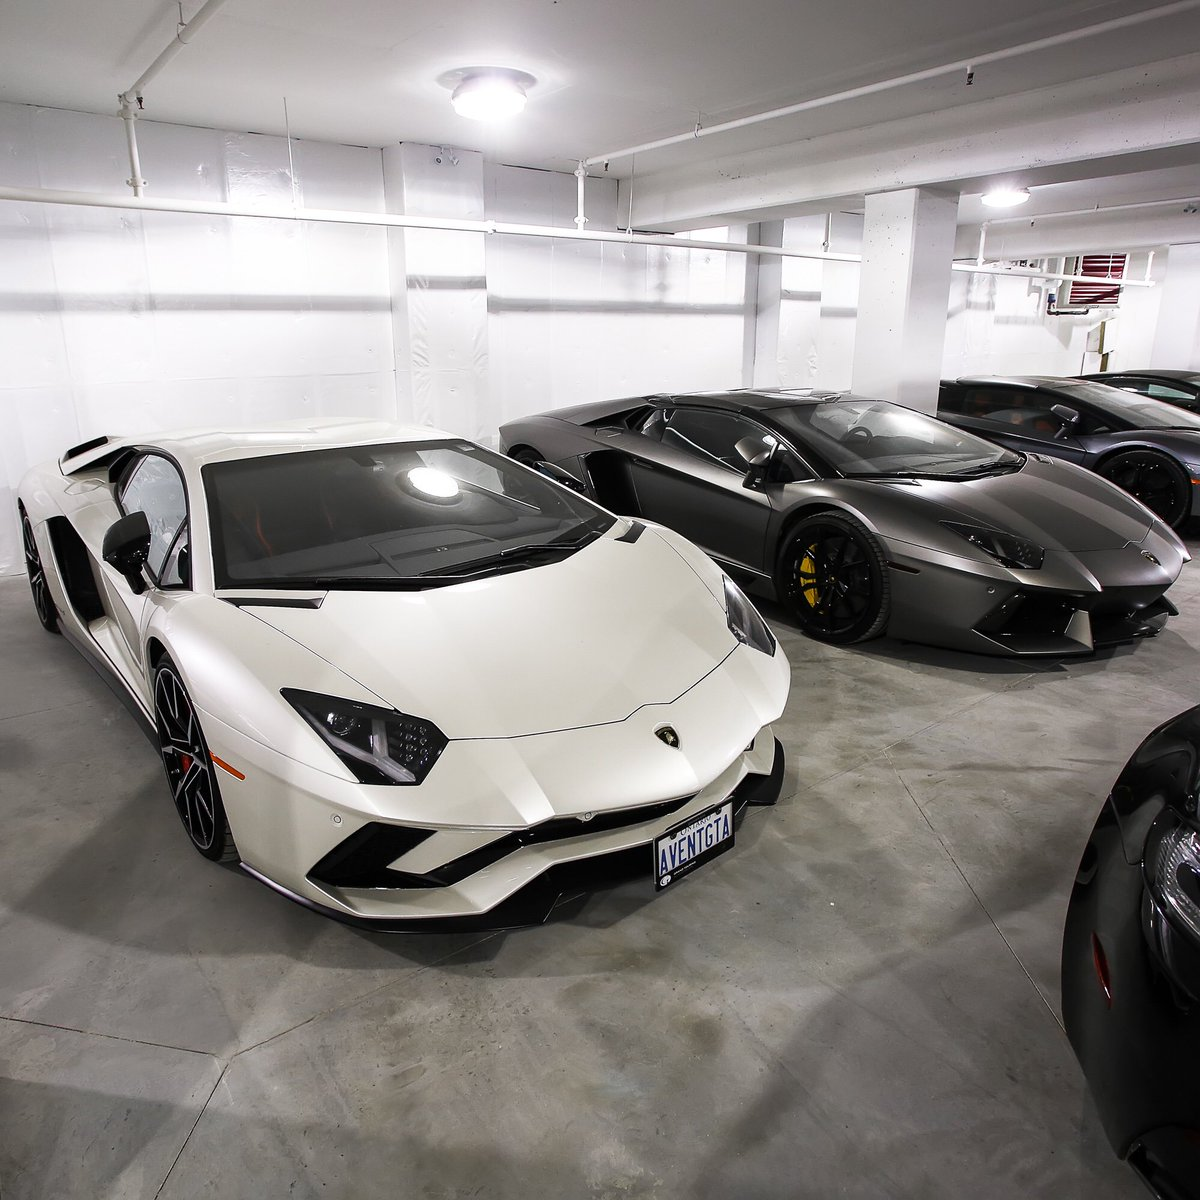 Heather Ballentine On Twitter Old Vs New Lamborghini